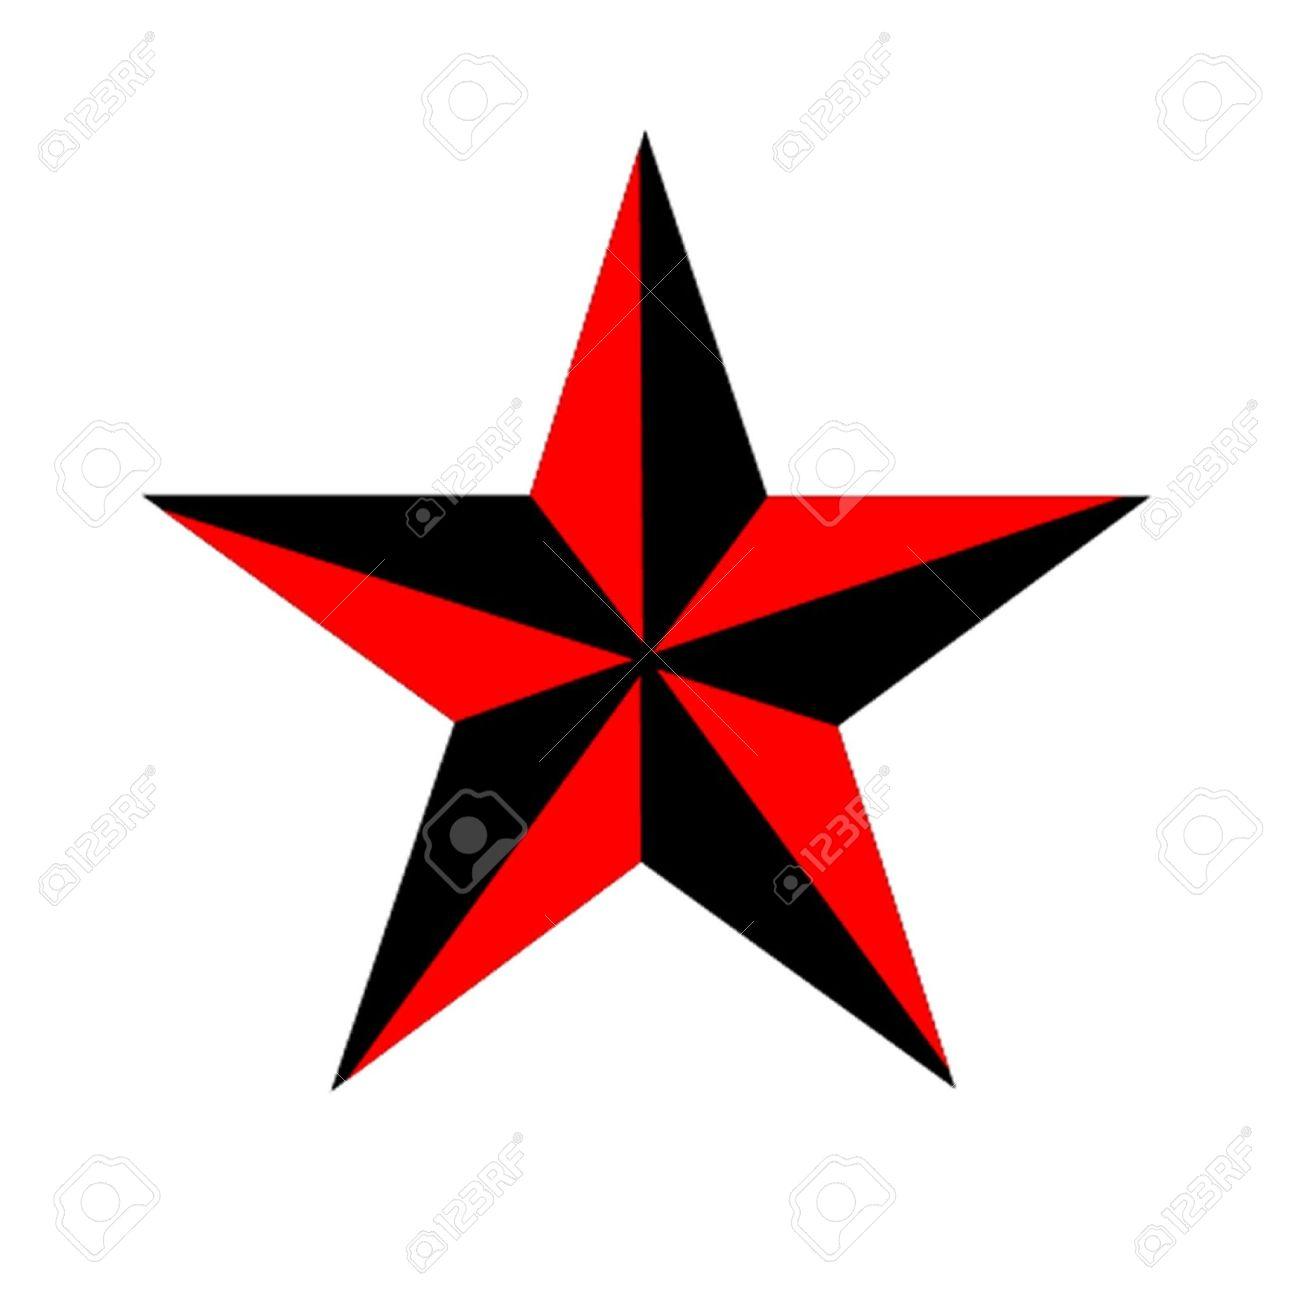 22 909 north star cliparts stock vector and royalty free north star rh 123rf com Star Over Bethlehem Clip Art north star clip art free